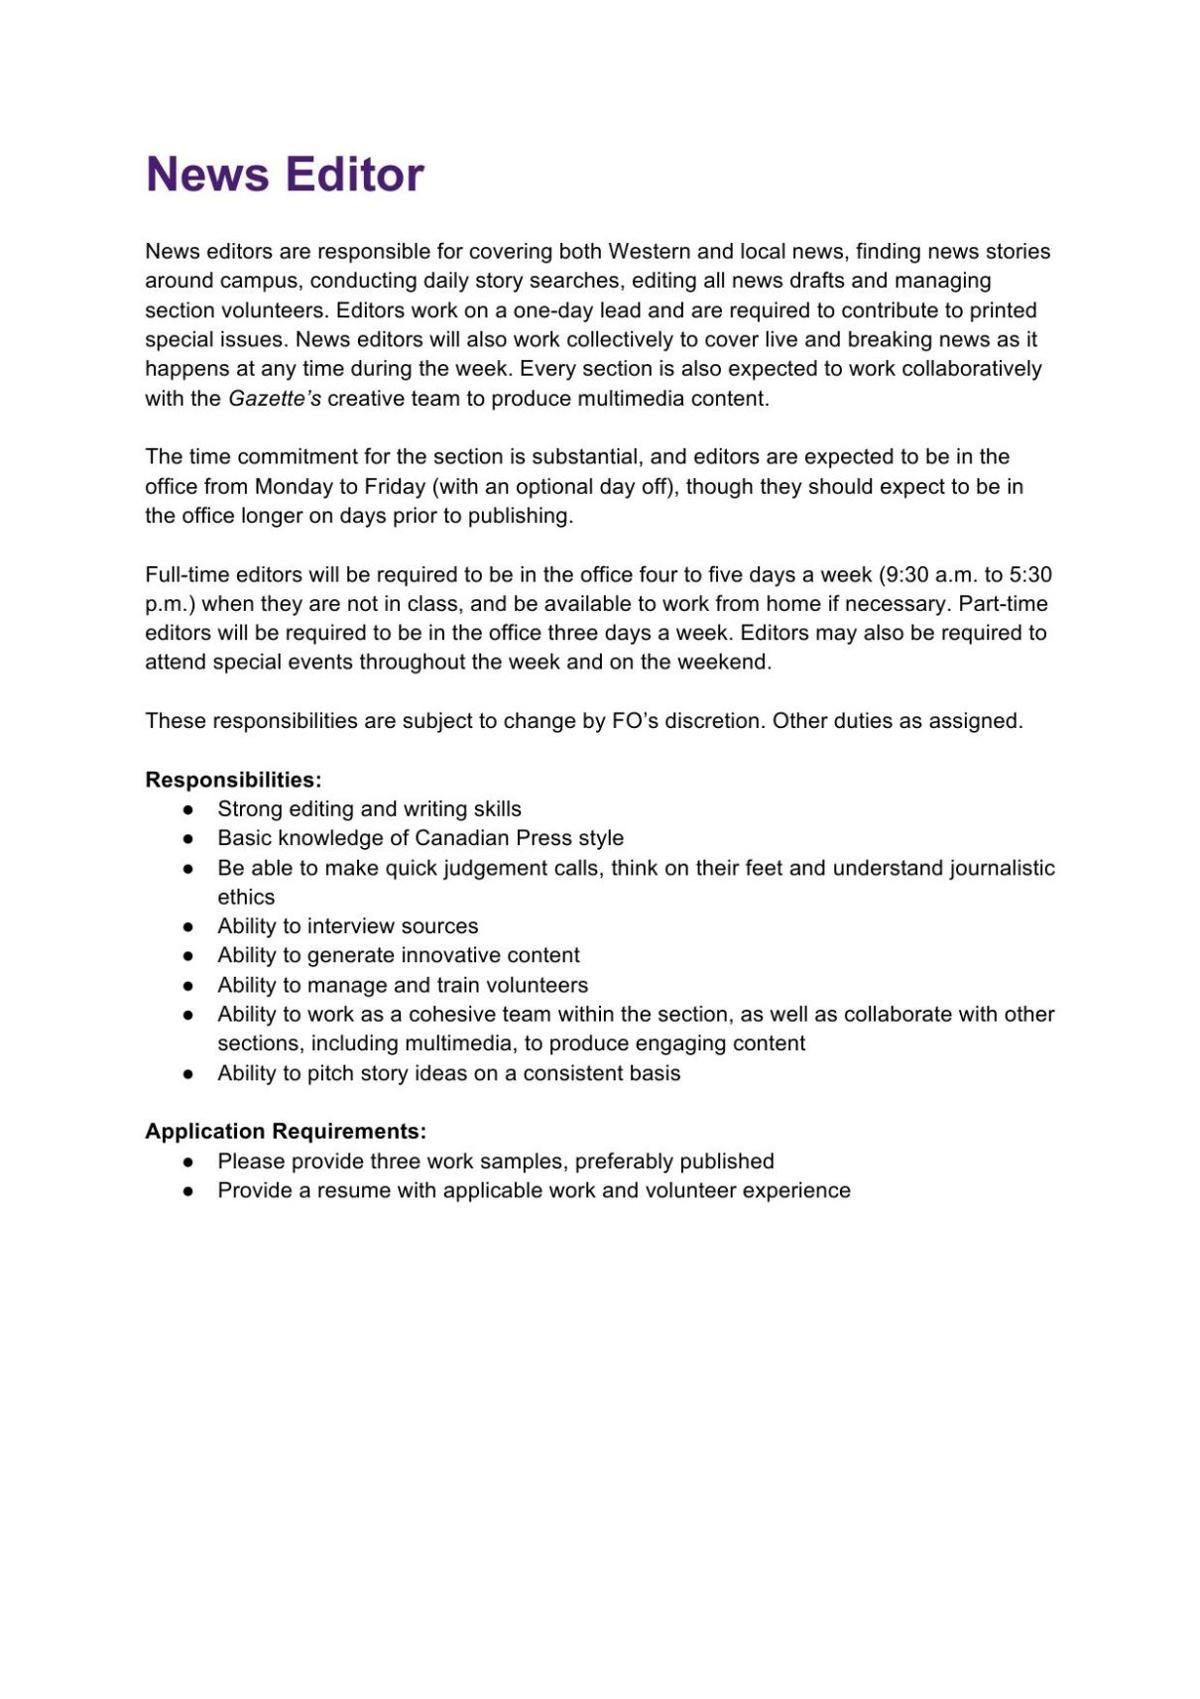 News Editor Job Description 2020